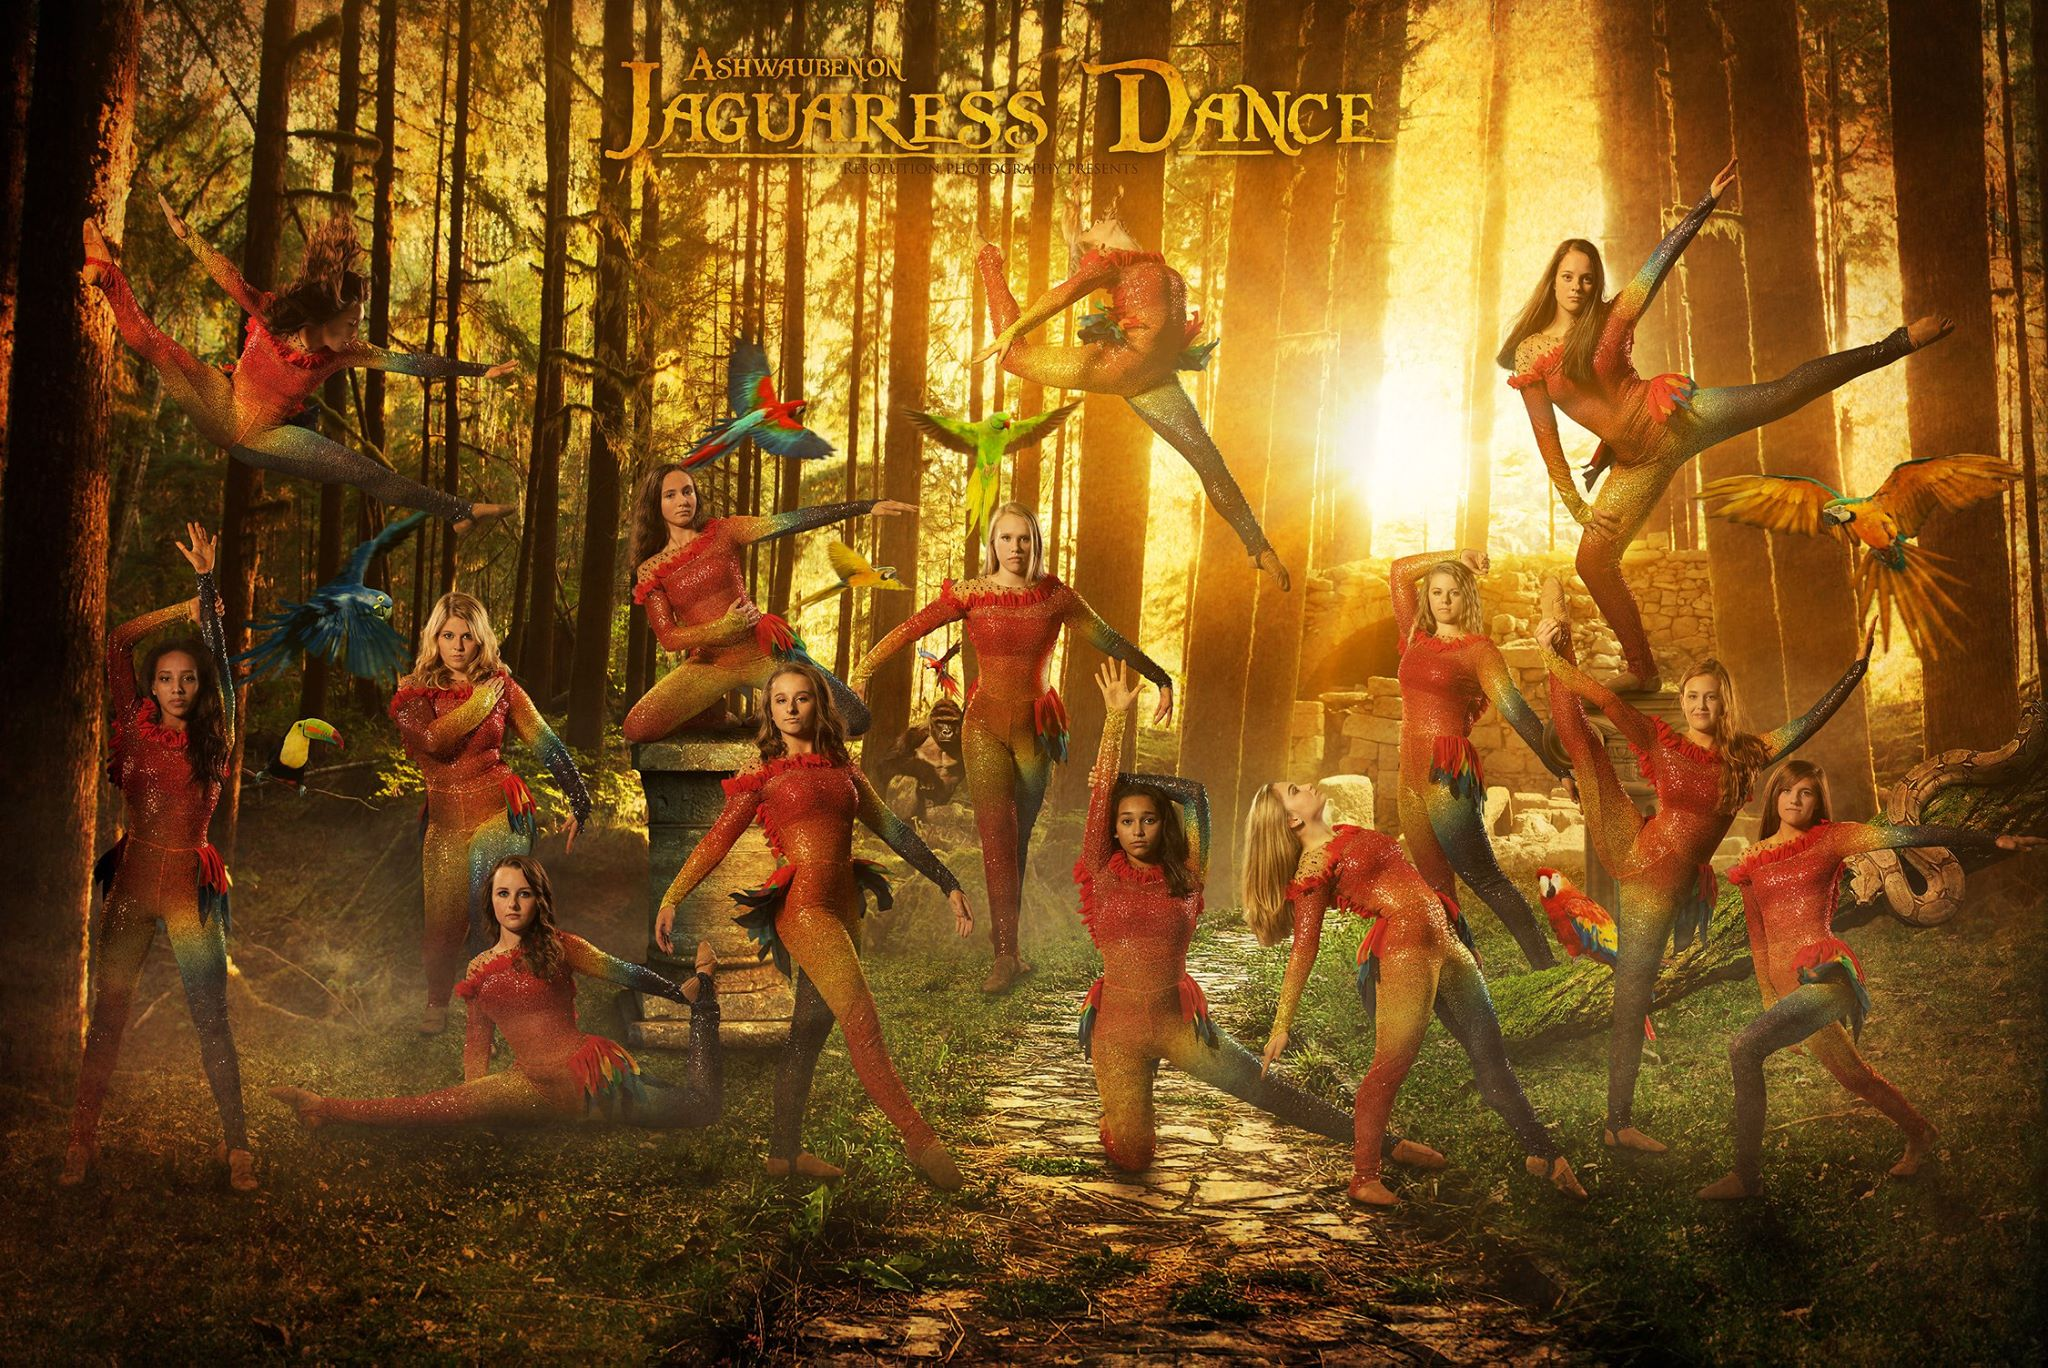 Ashwaubenon High School Dance Team Custom High Kick Costume